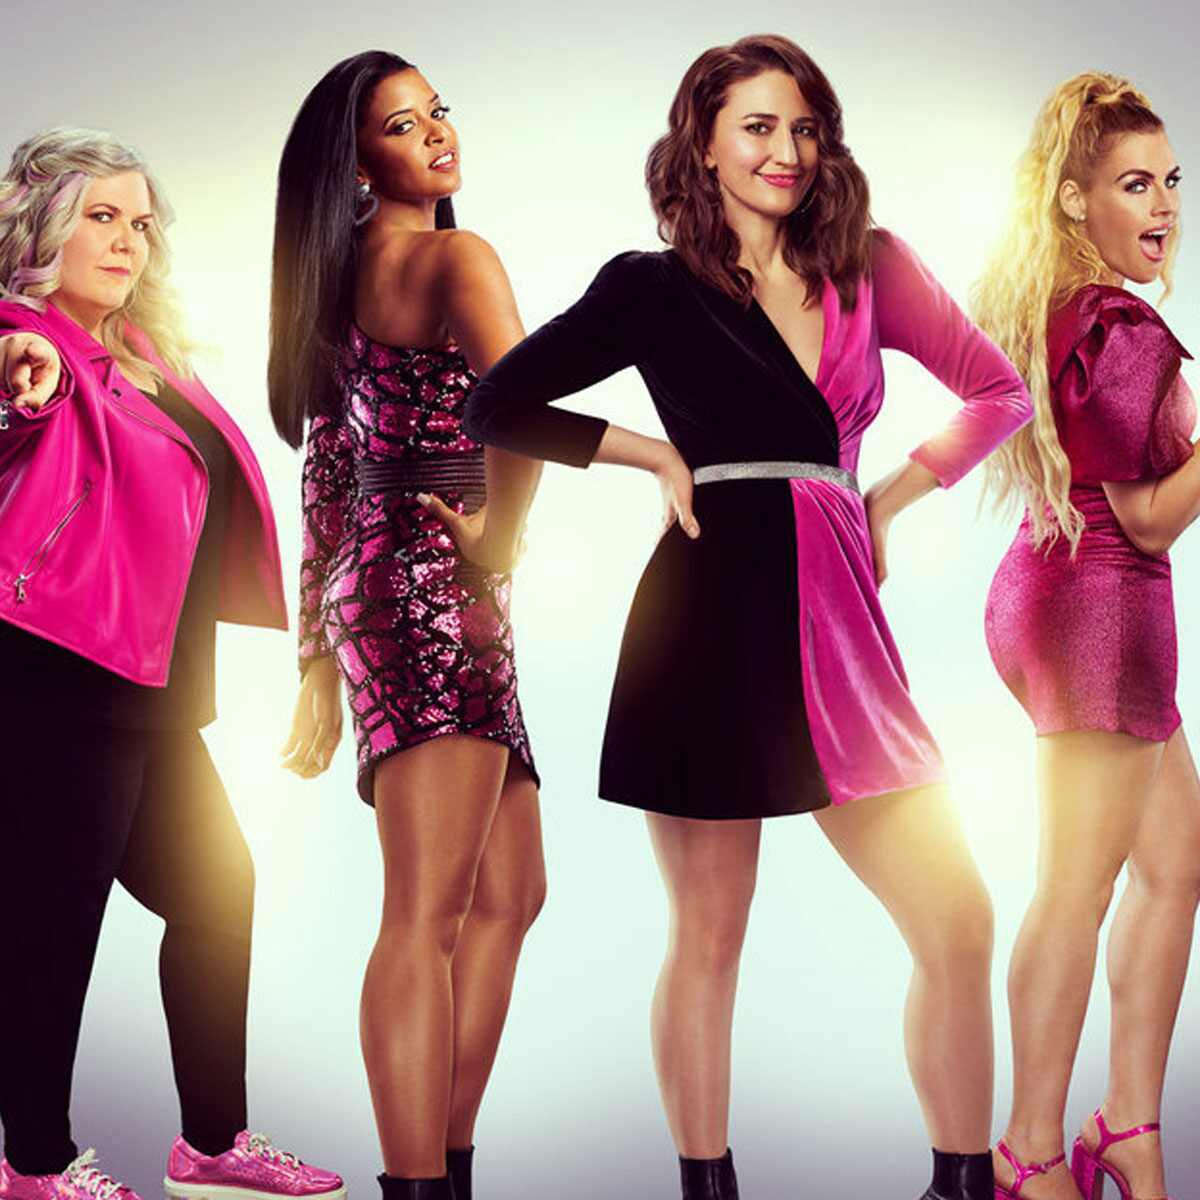 Girls5eva, Busy Philipps, Sara Bareilles, Paula Pell, Renee Elise Goldsberry